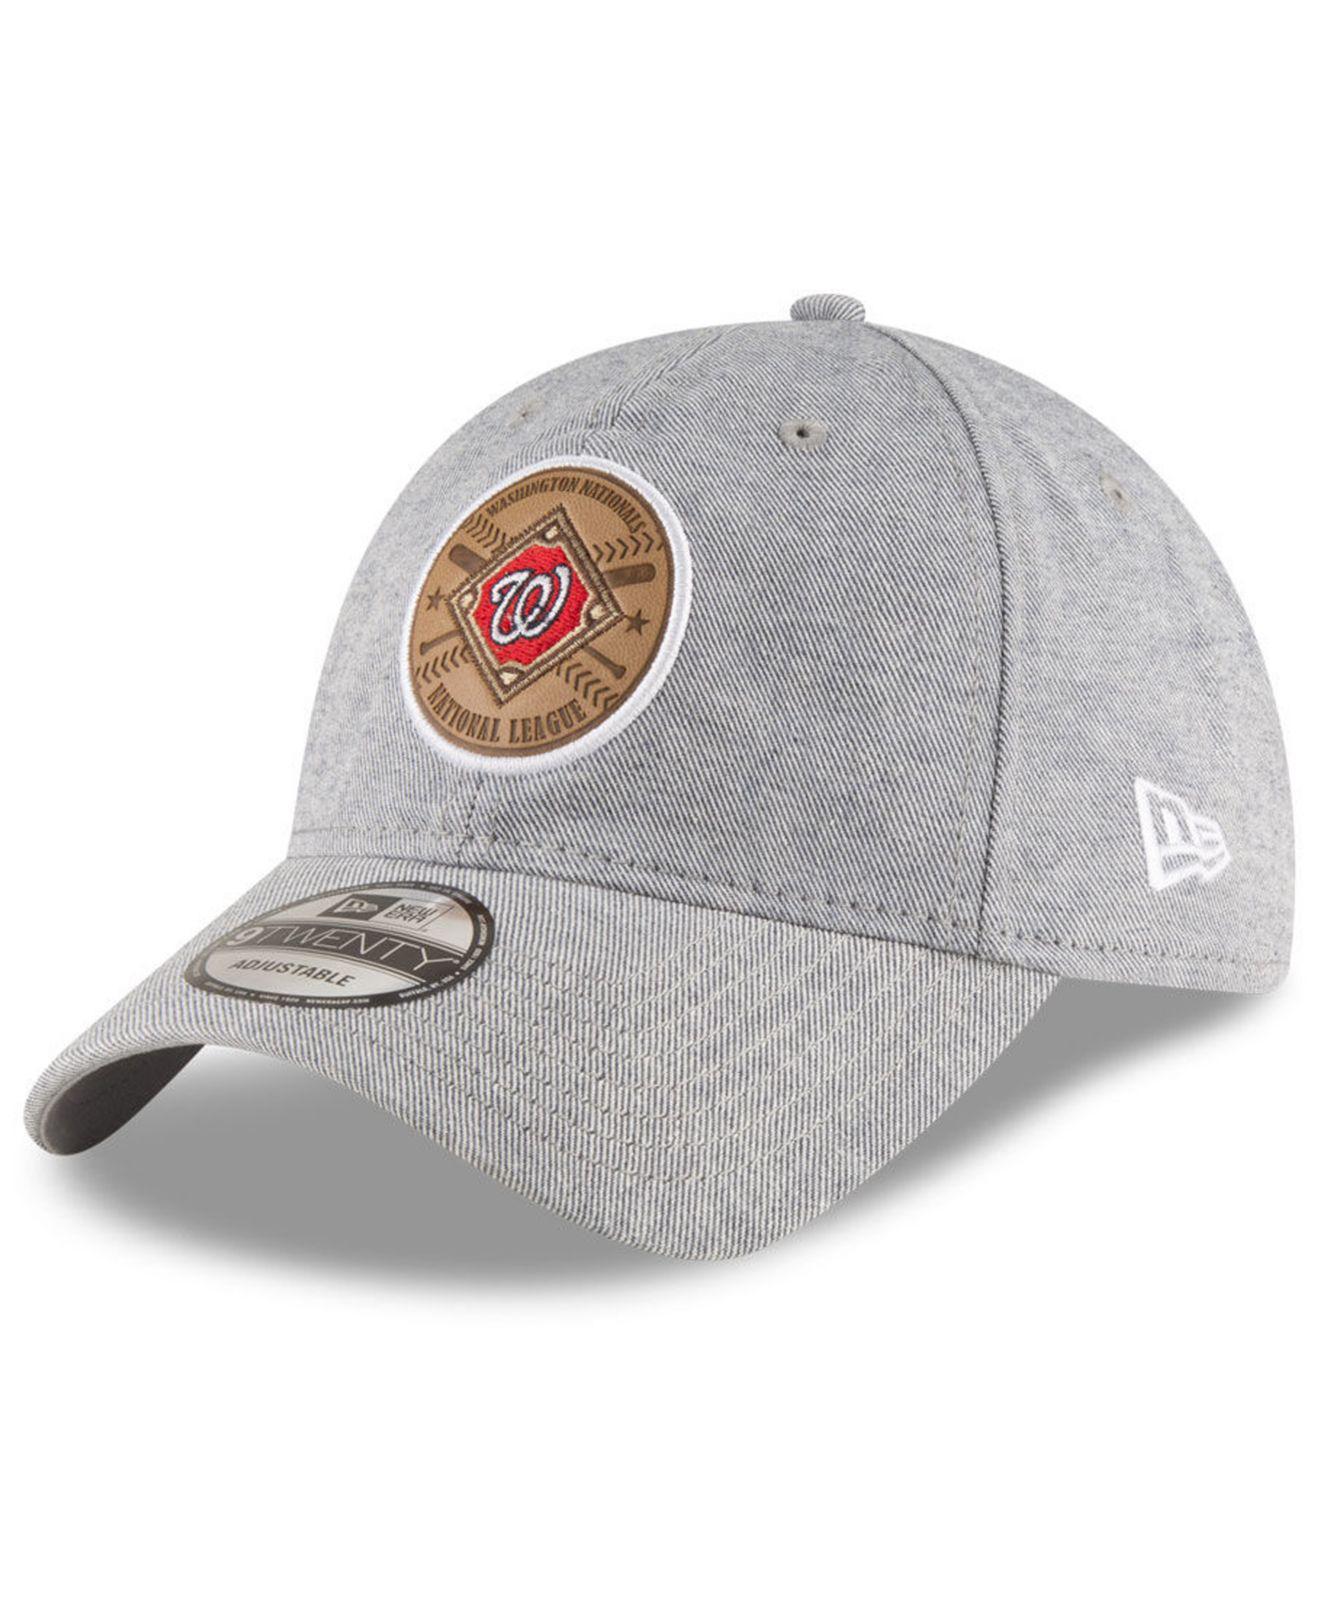 cccf9b91196b44 discount code for los angeles angels new era mlb 9twenty adjustable  baseball hat cap men one size a6725 3e0d3; wholesale ktz. mens gray  washington nationals ...